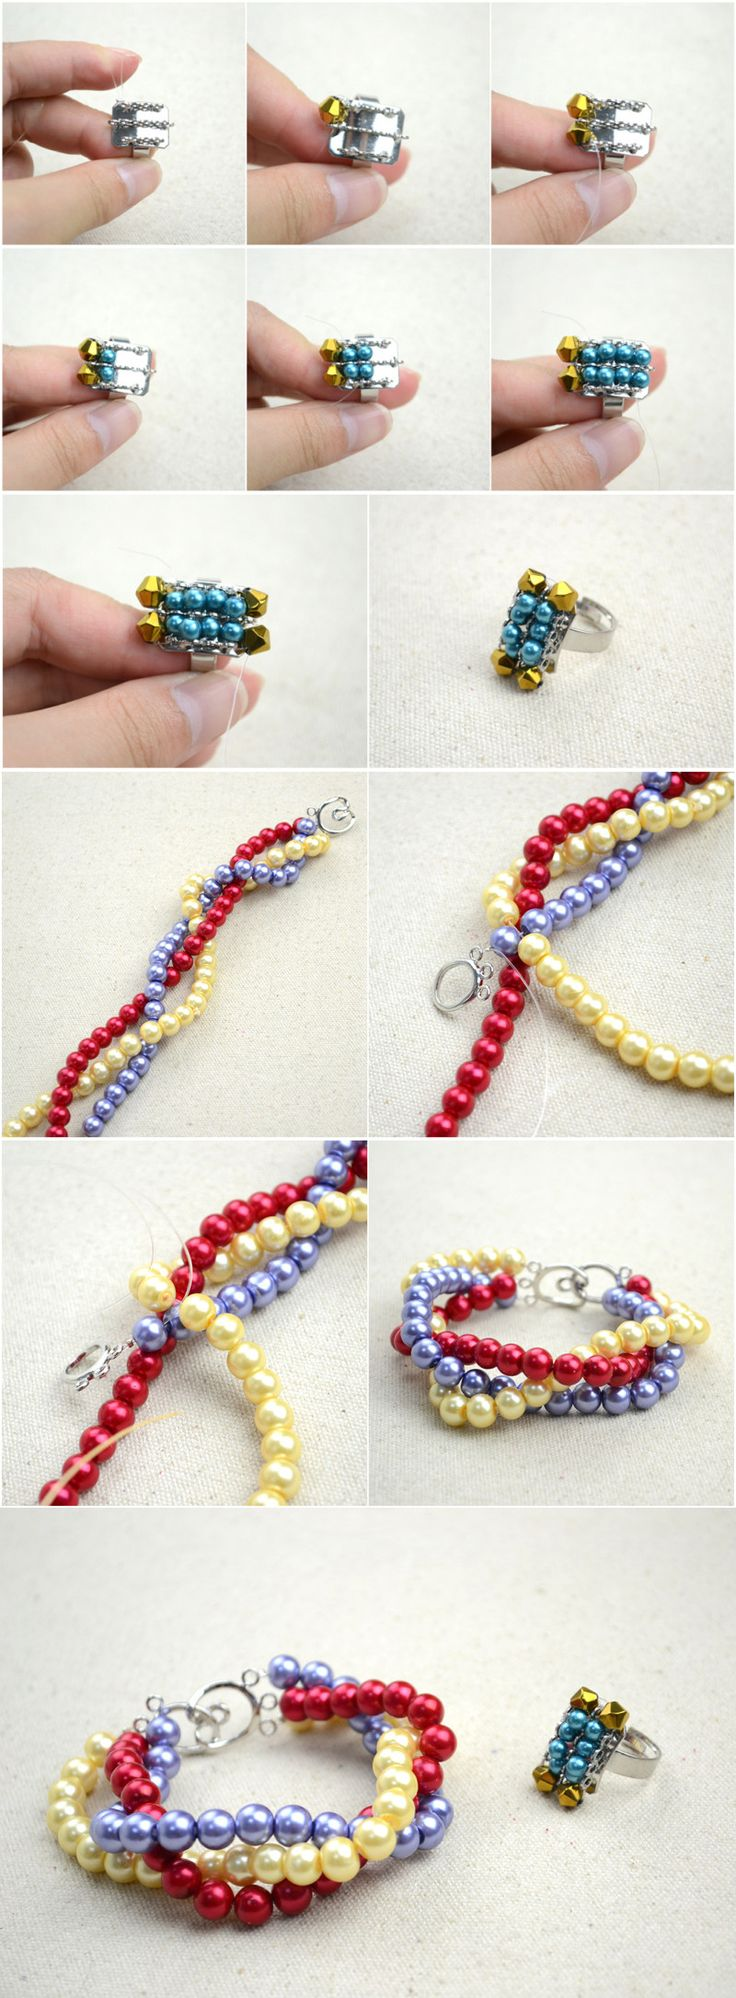 tutorial on handmade beaded jewelry designs simple pearl